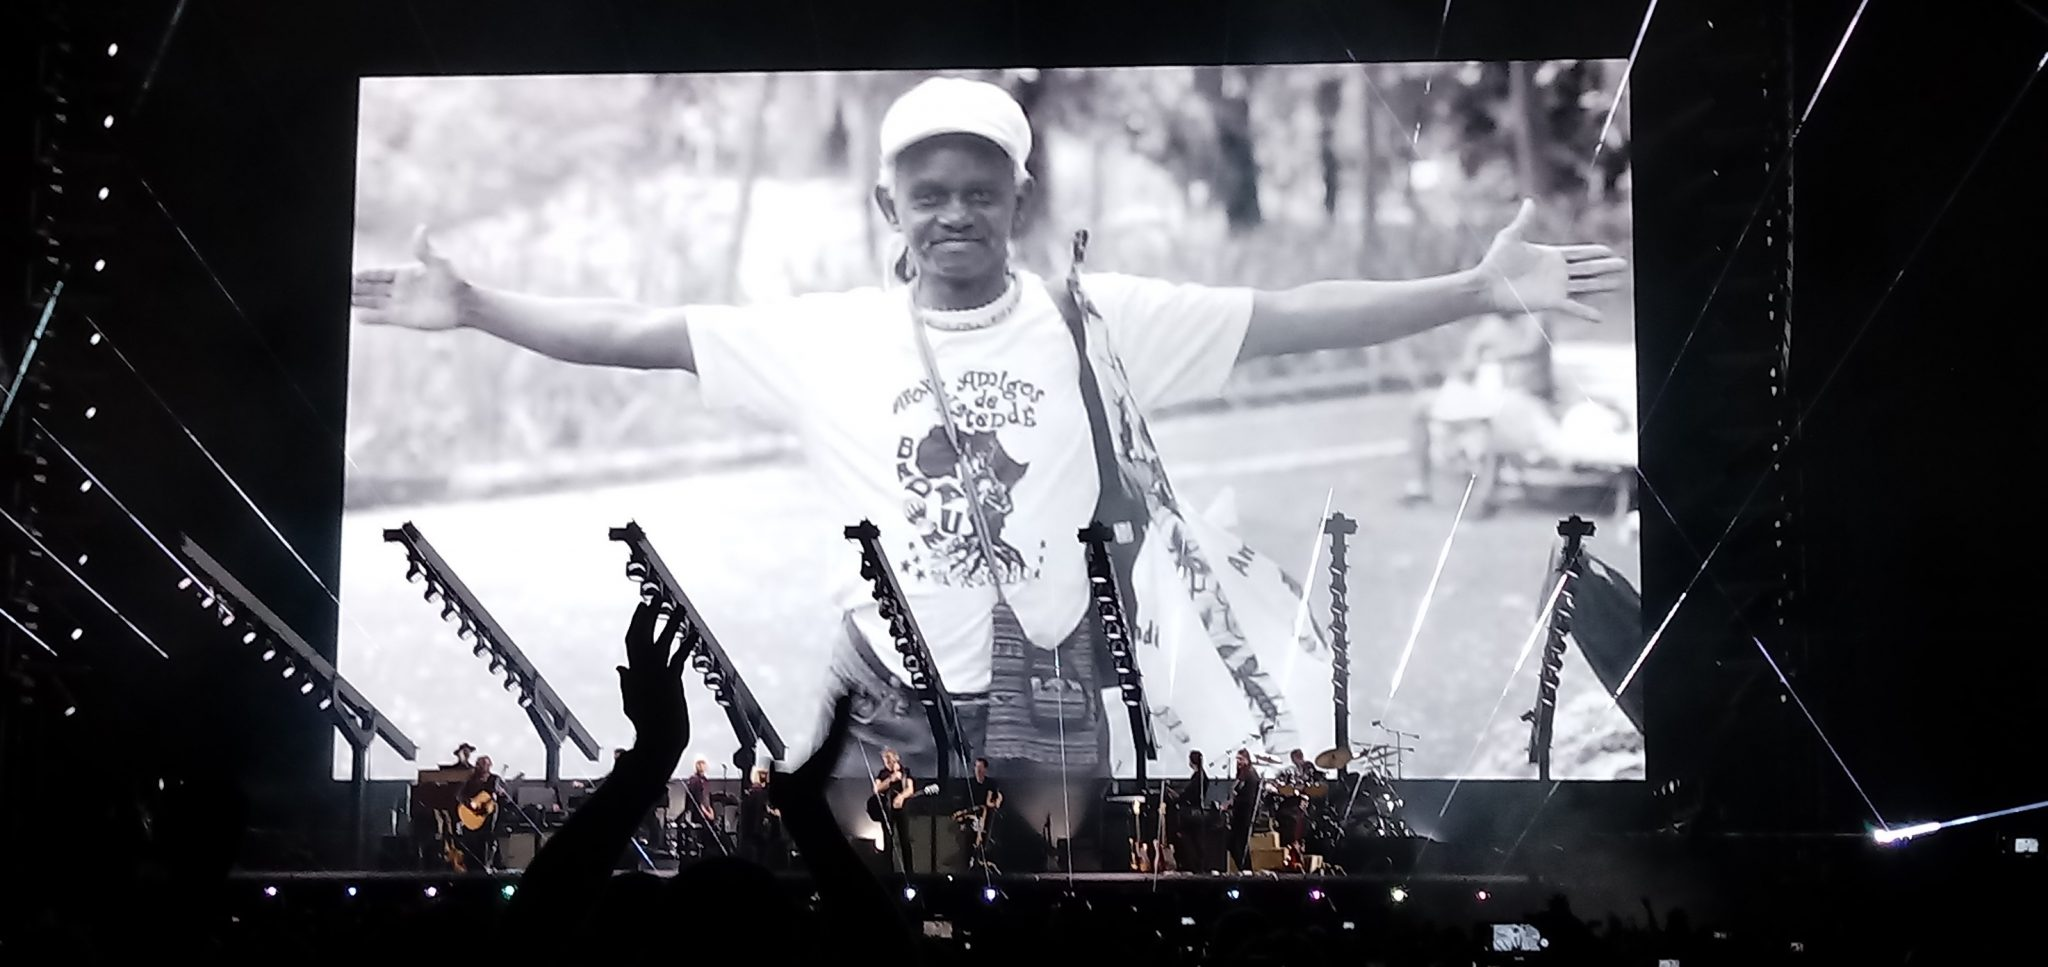 Roger Waters Show Salvador Moa do Katendê